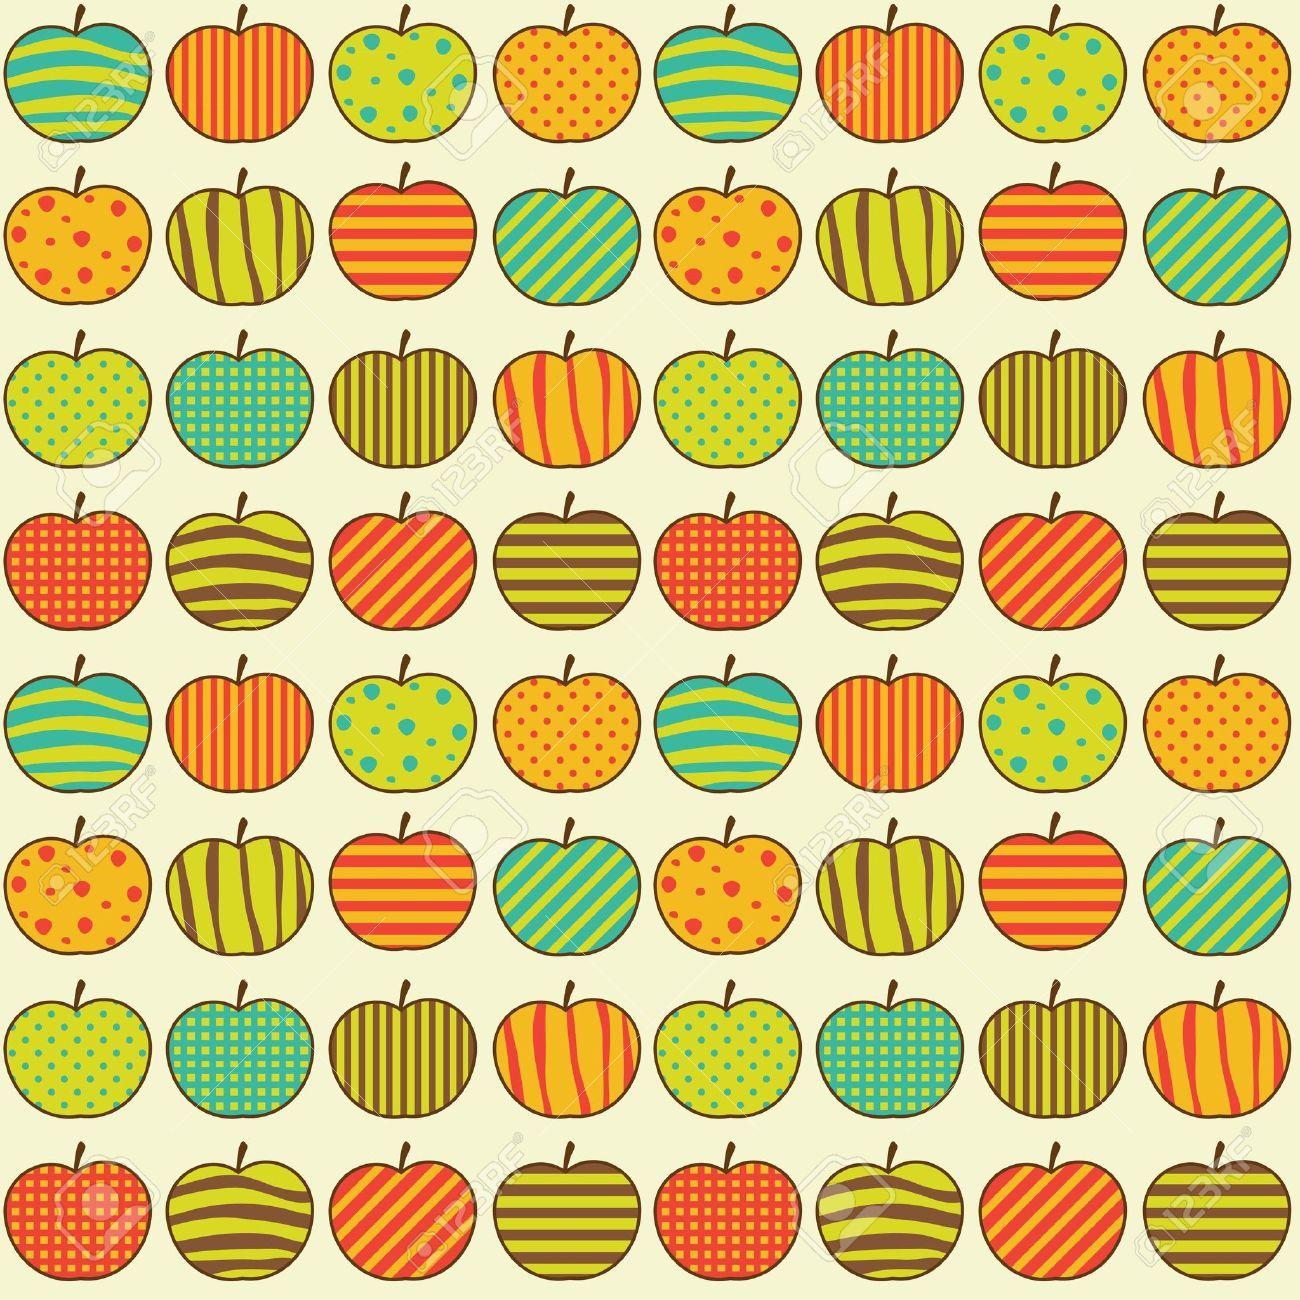 Vintage kitchen wallpaper patterns - Seamless Retro Pattern With Apples